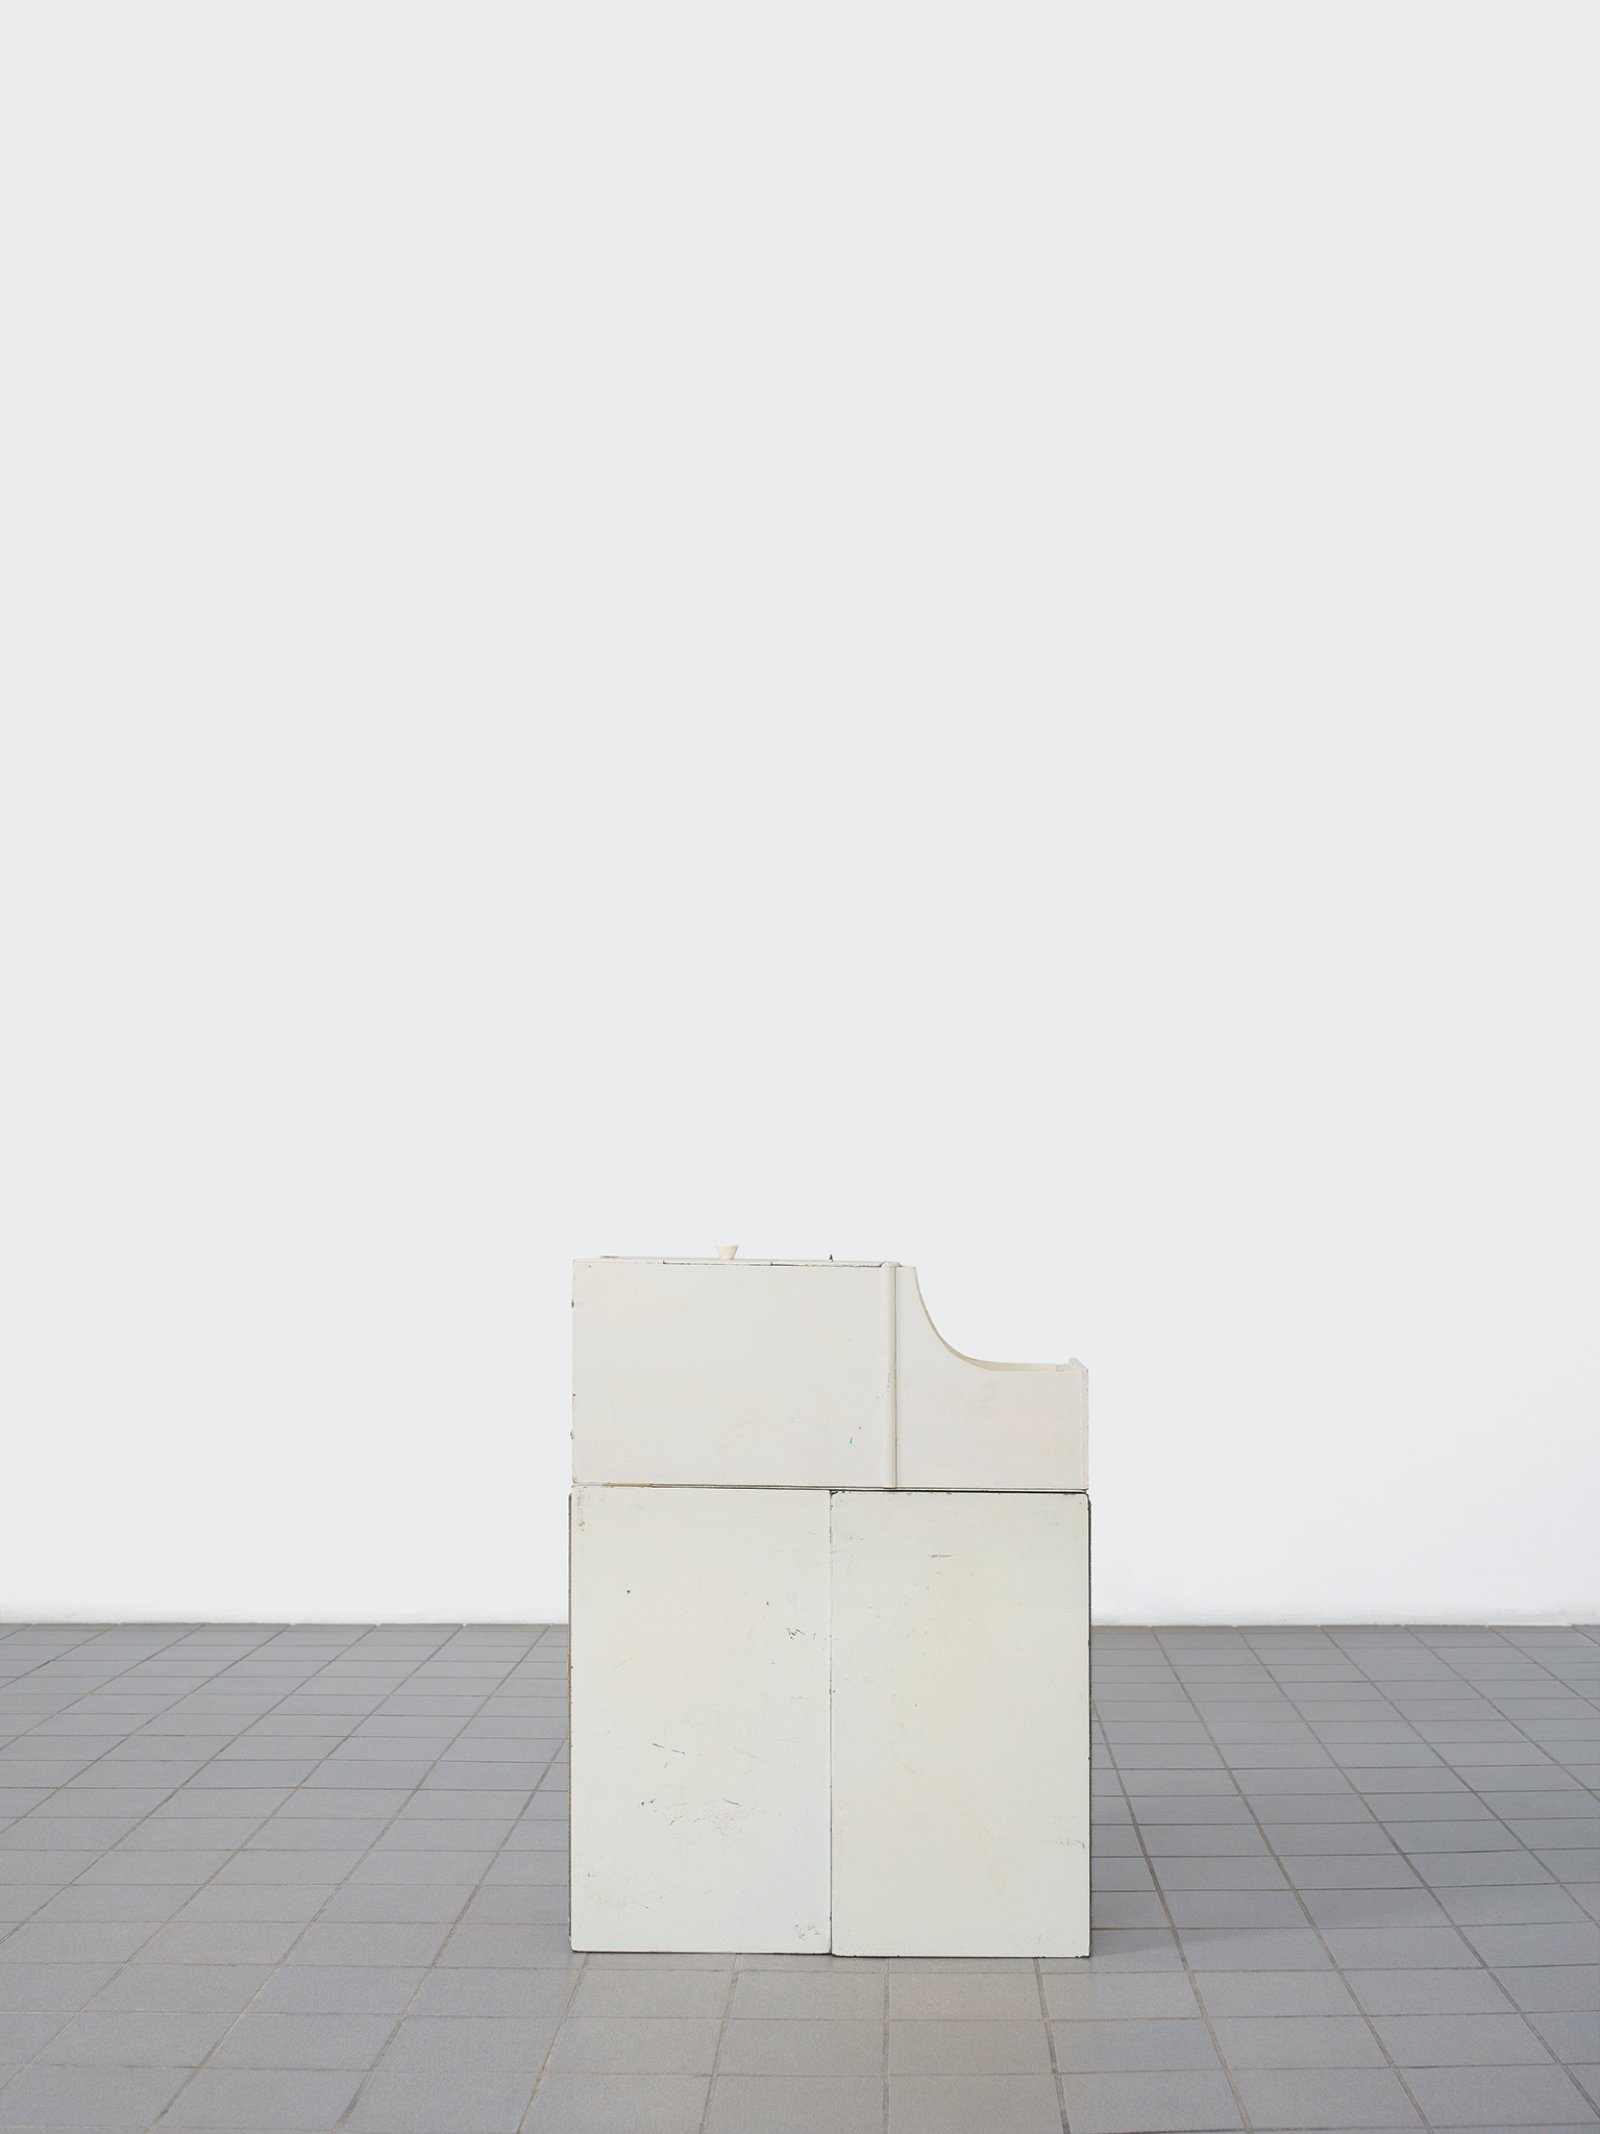 Geoffrey Farmer, Battered Moonlight (Pale Fire Freedom Machine), 2005, lightjet (endura archival photo paper), 50 x 38 in. (126 x 97 cm)